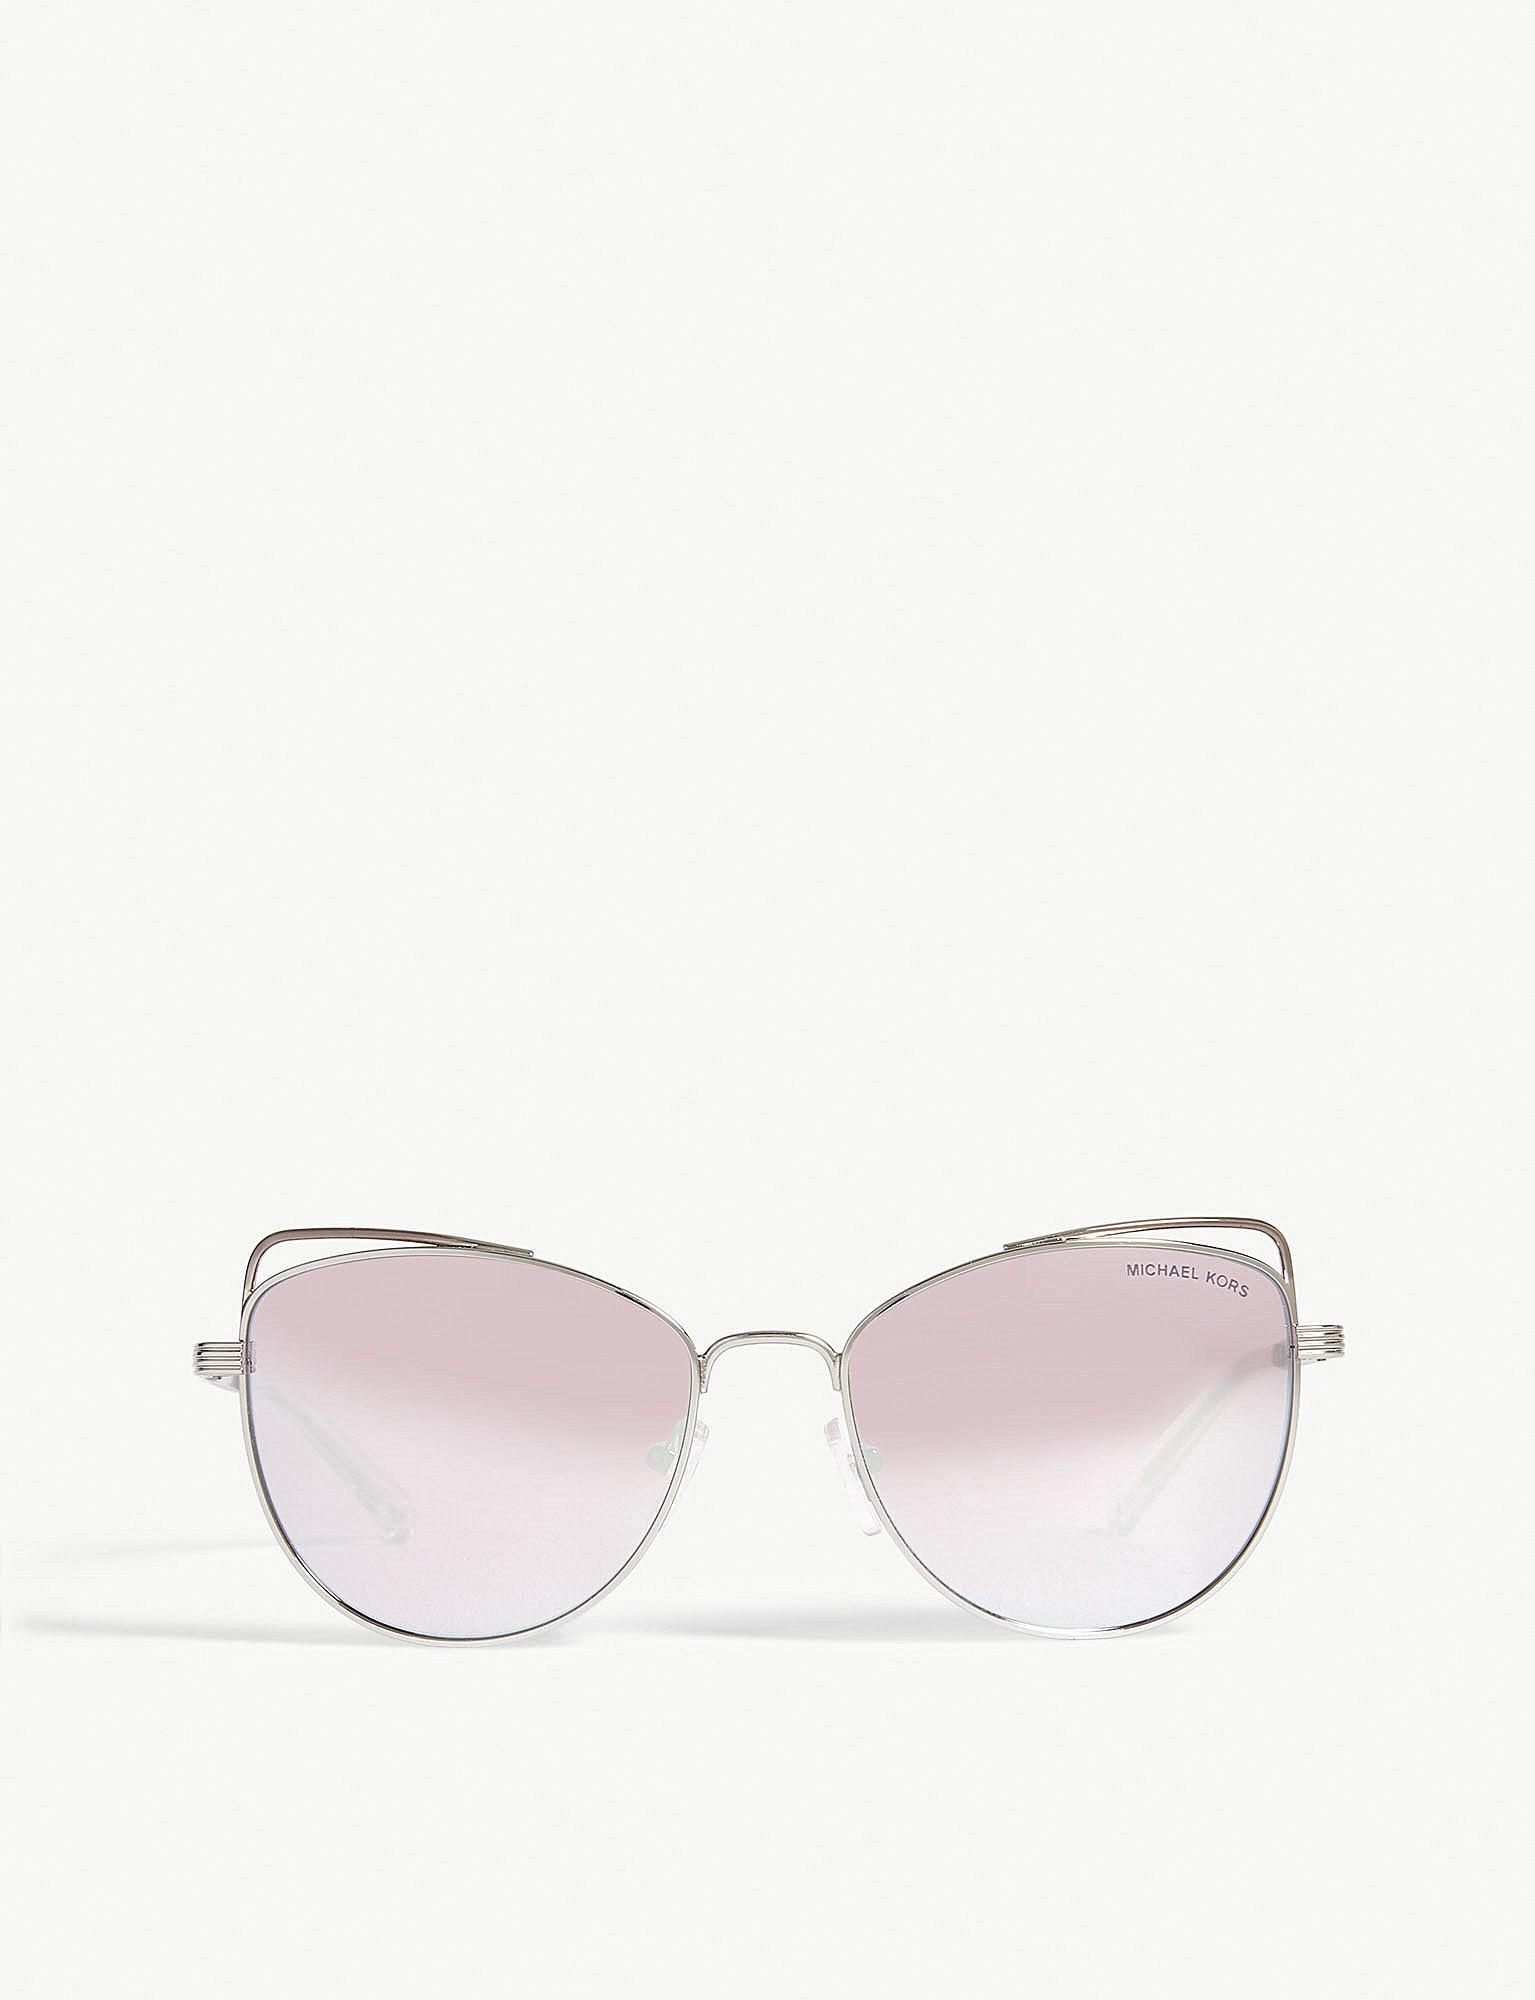 michael kors silver gold st lucia cat s eye sunglasses mk1035 in Oakley Frogskins Sunglasses view fullscreen